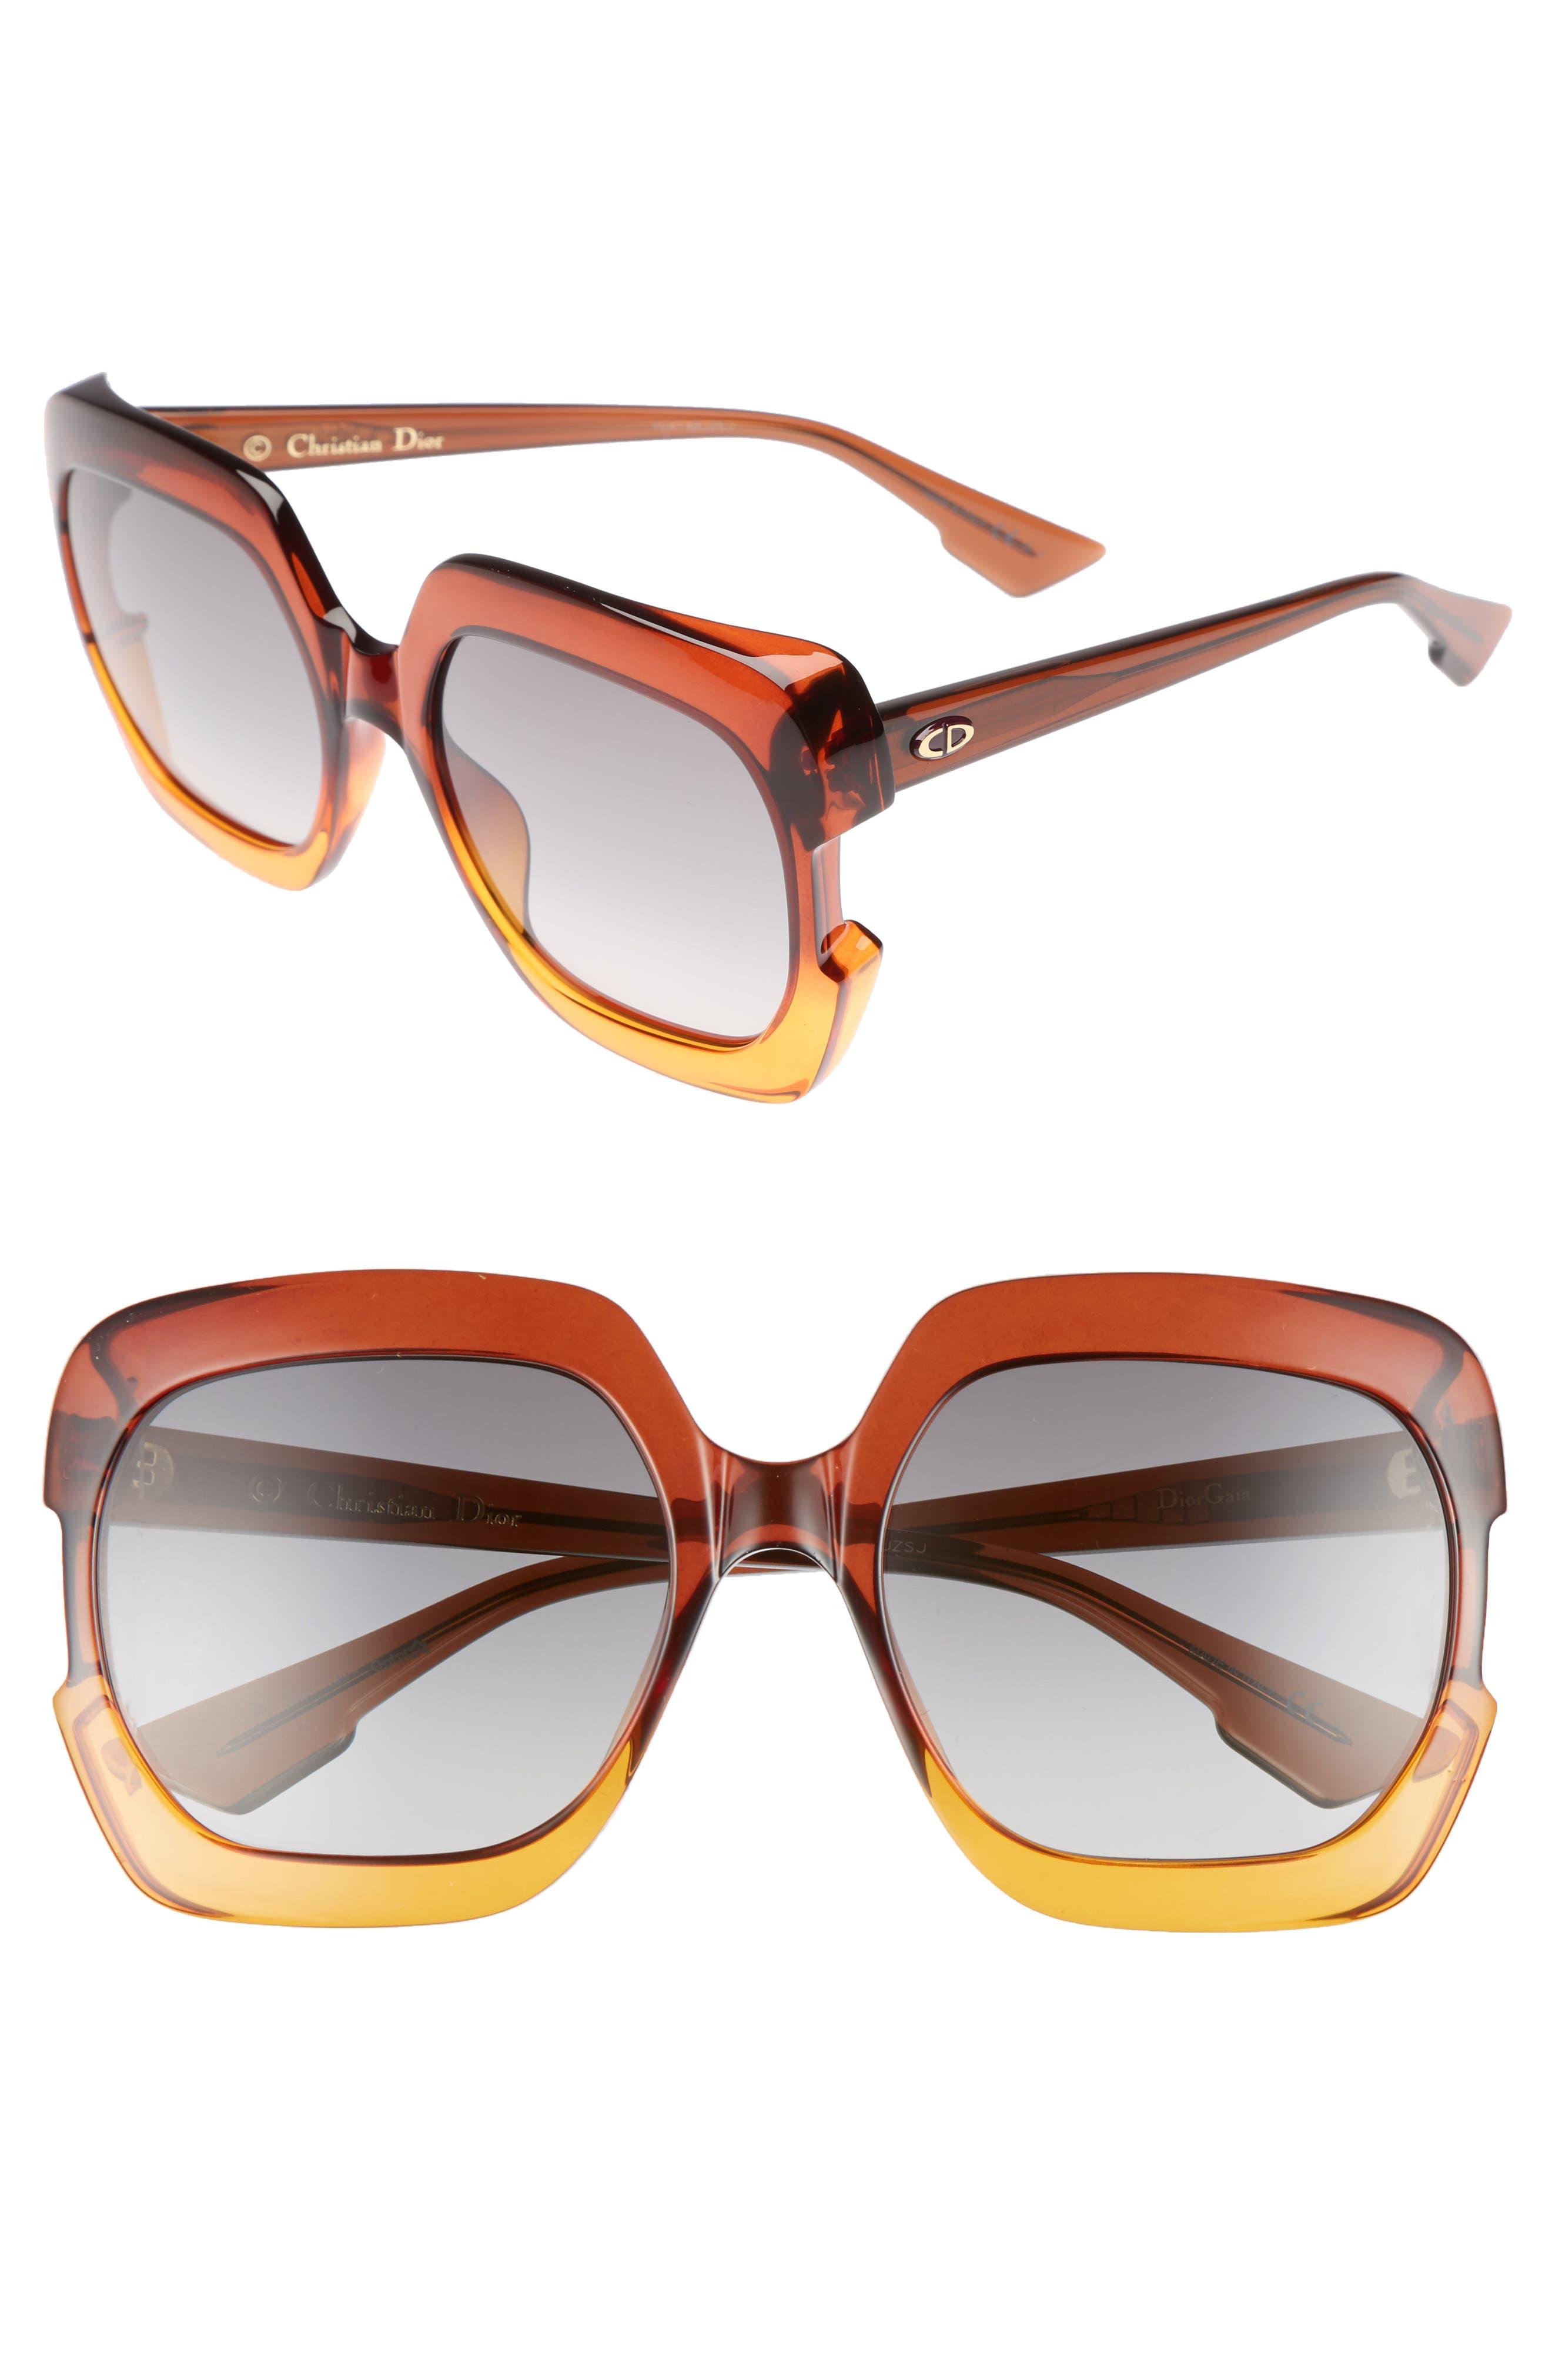 Gaia 58mm Square Sunglasses,                             Main thumbnail 1, color,                             Brown/ Orange